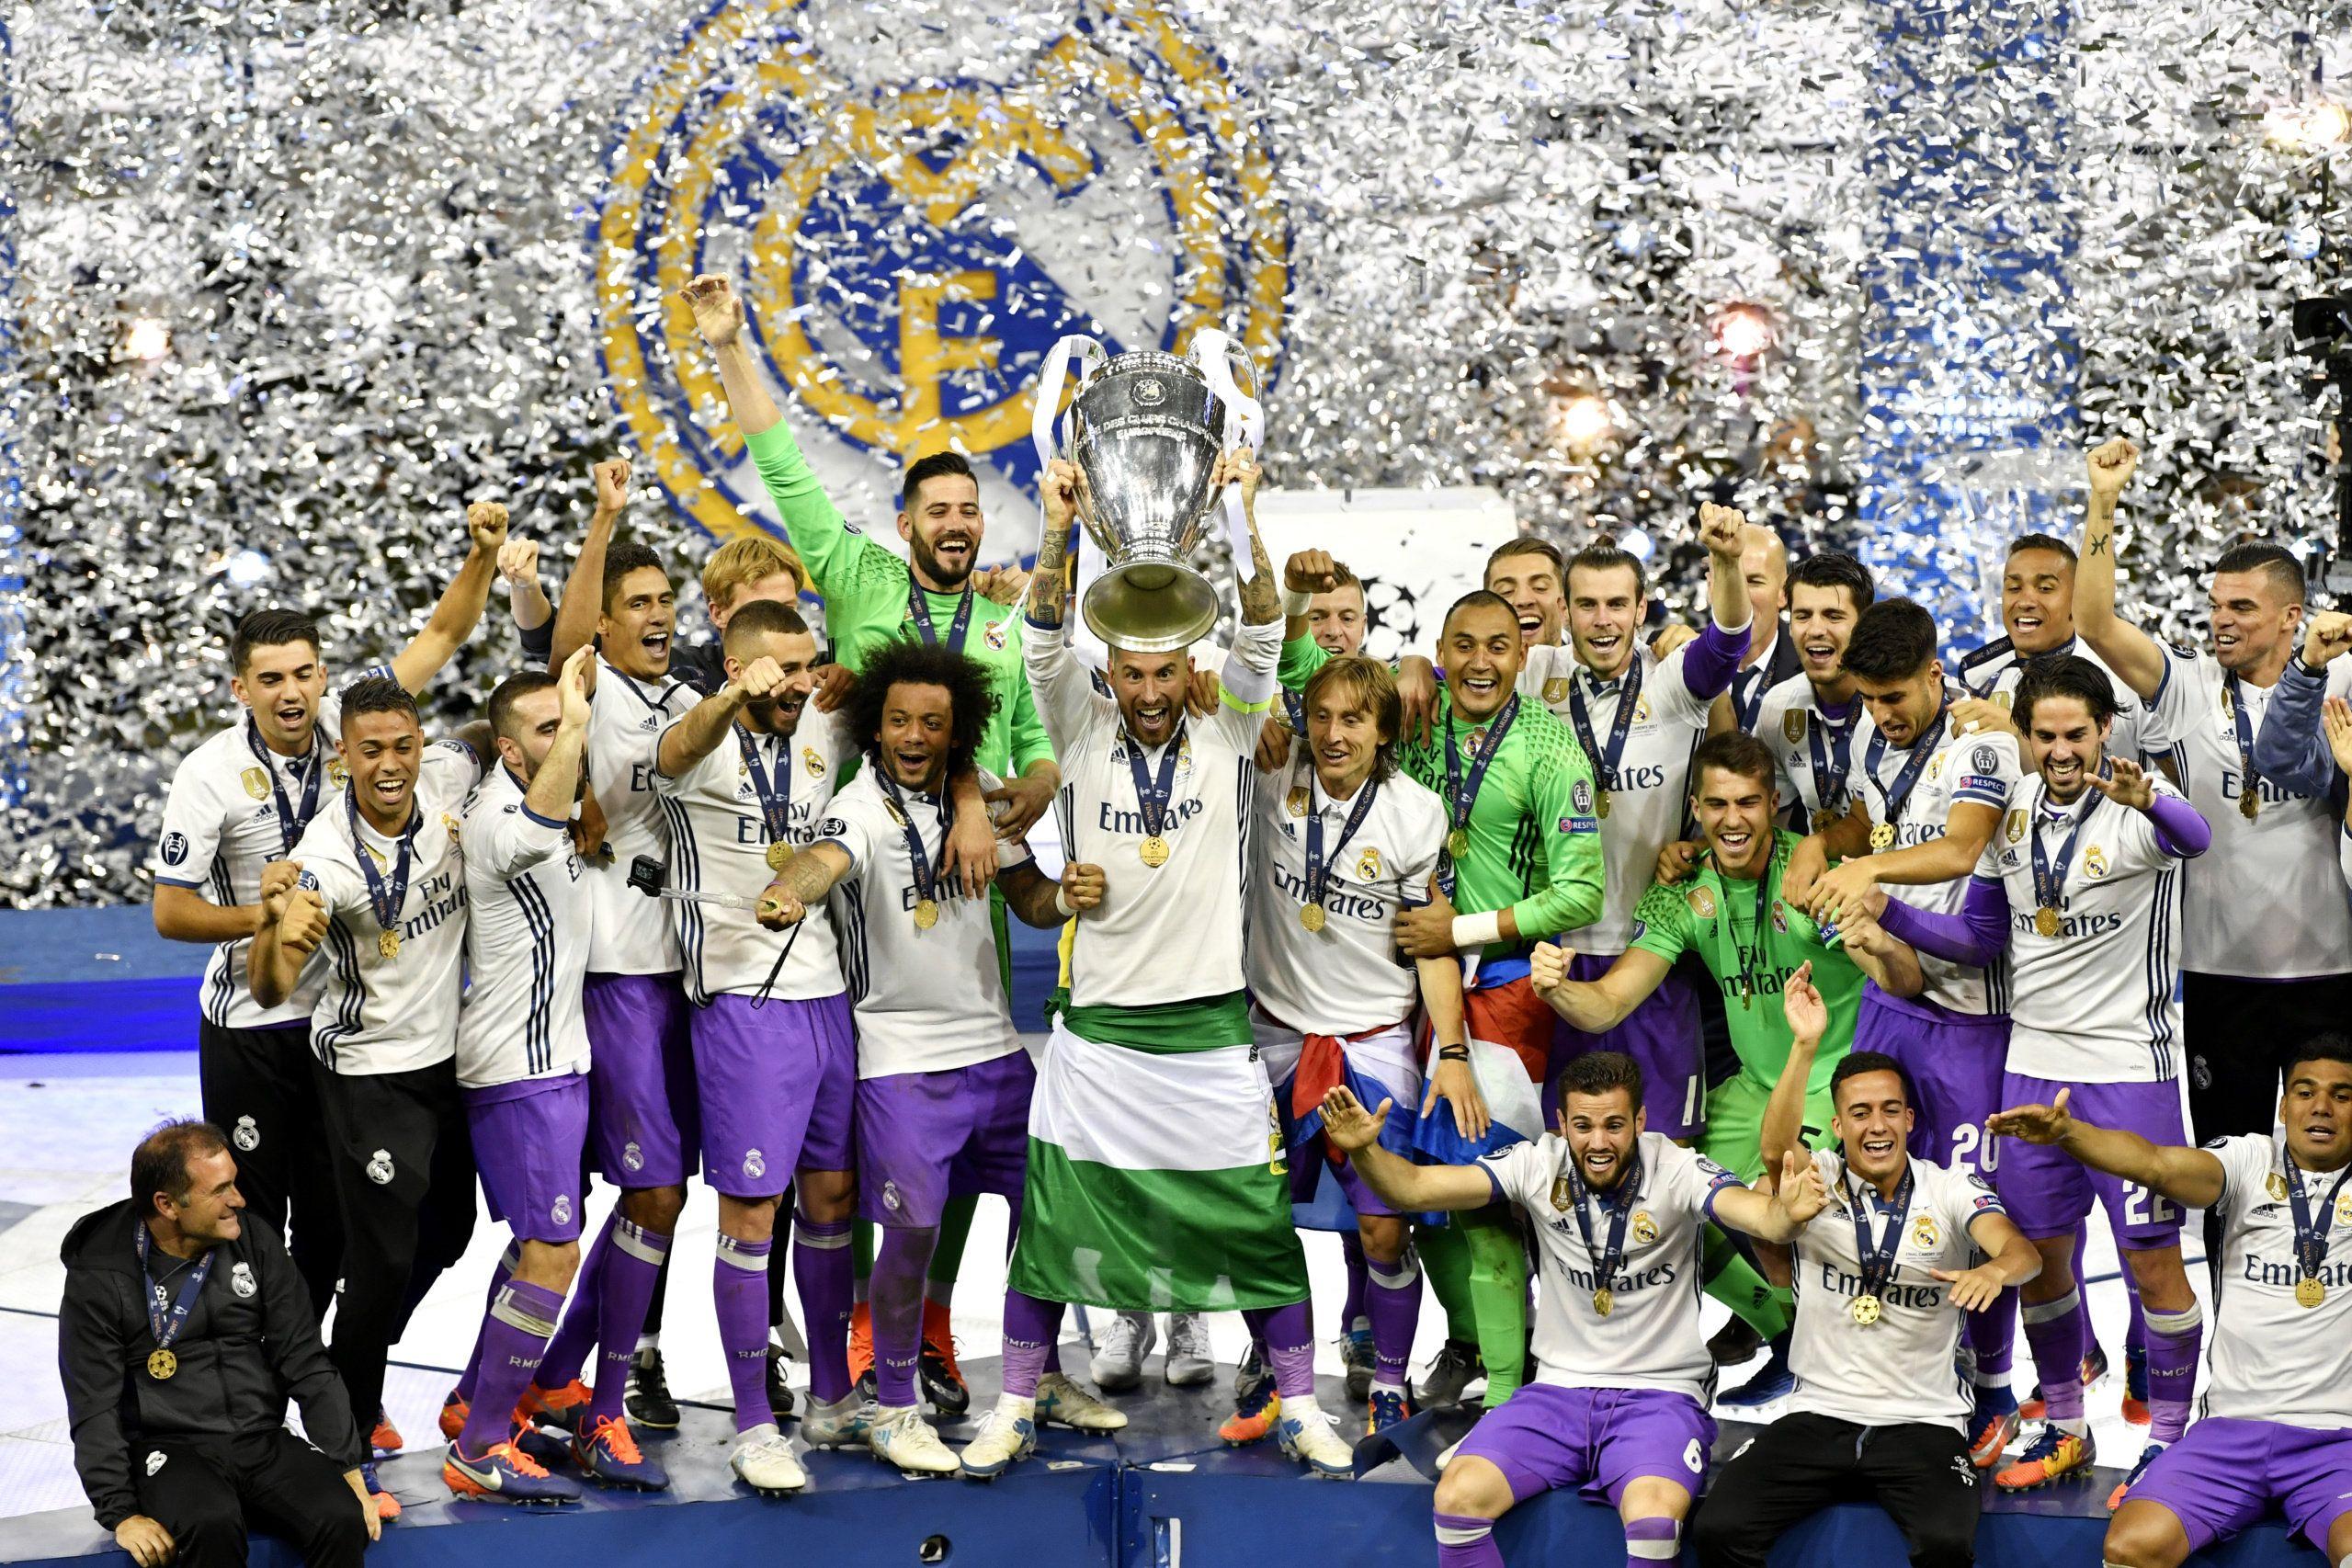 El Real Madrid es el actual campeón de la Champions. Foto: Elsalvadortimes.com